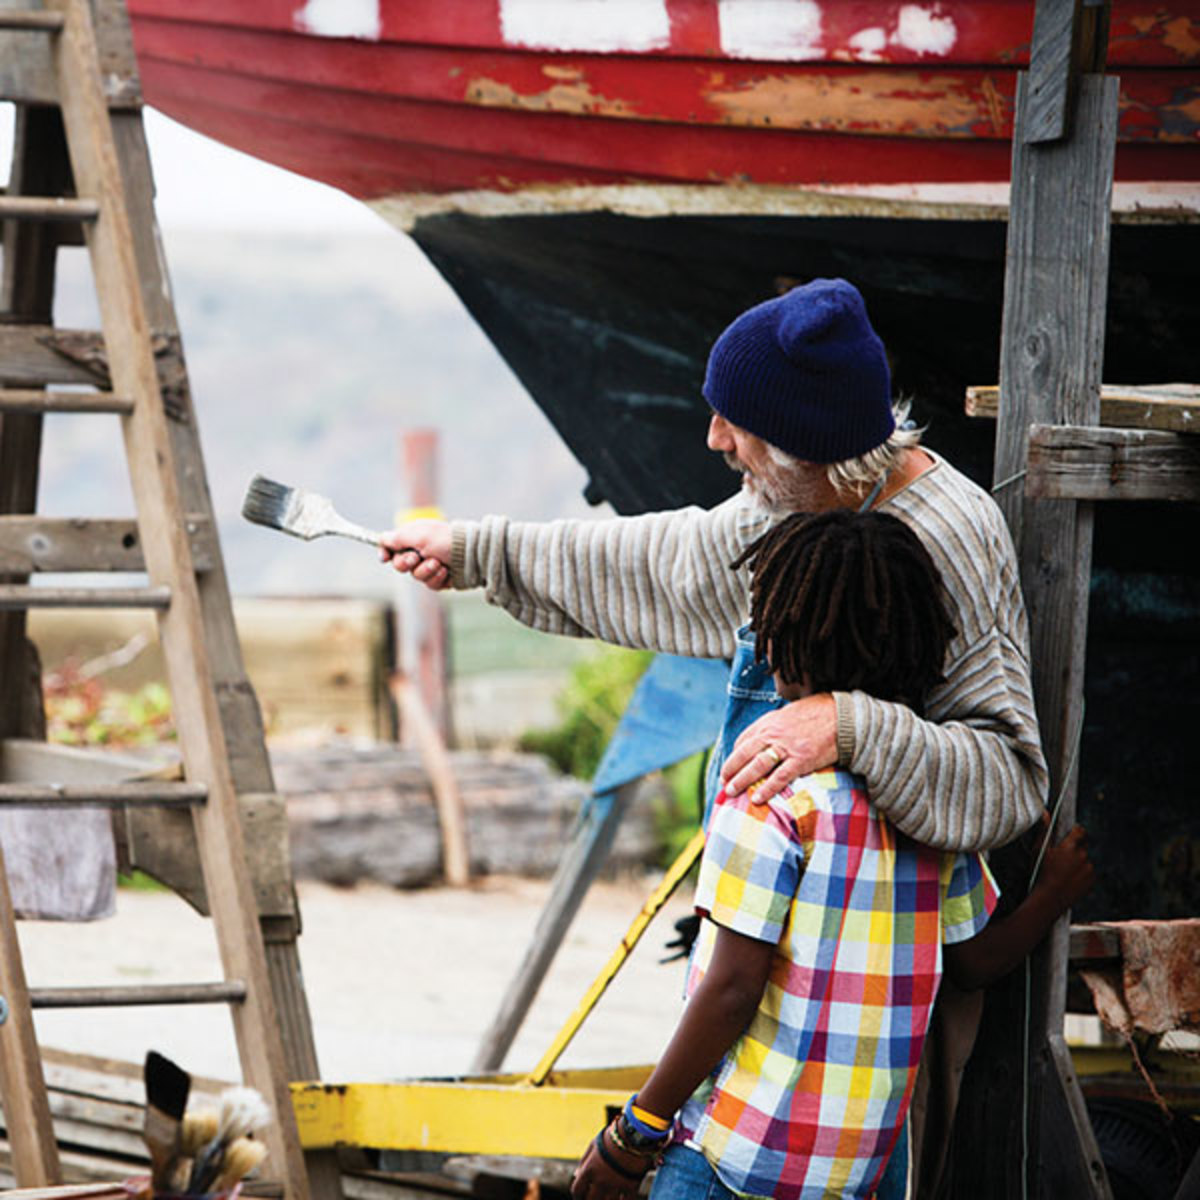 Scene from The Boat Builder